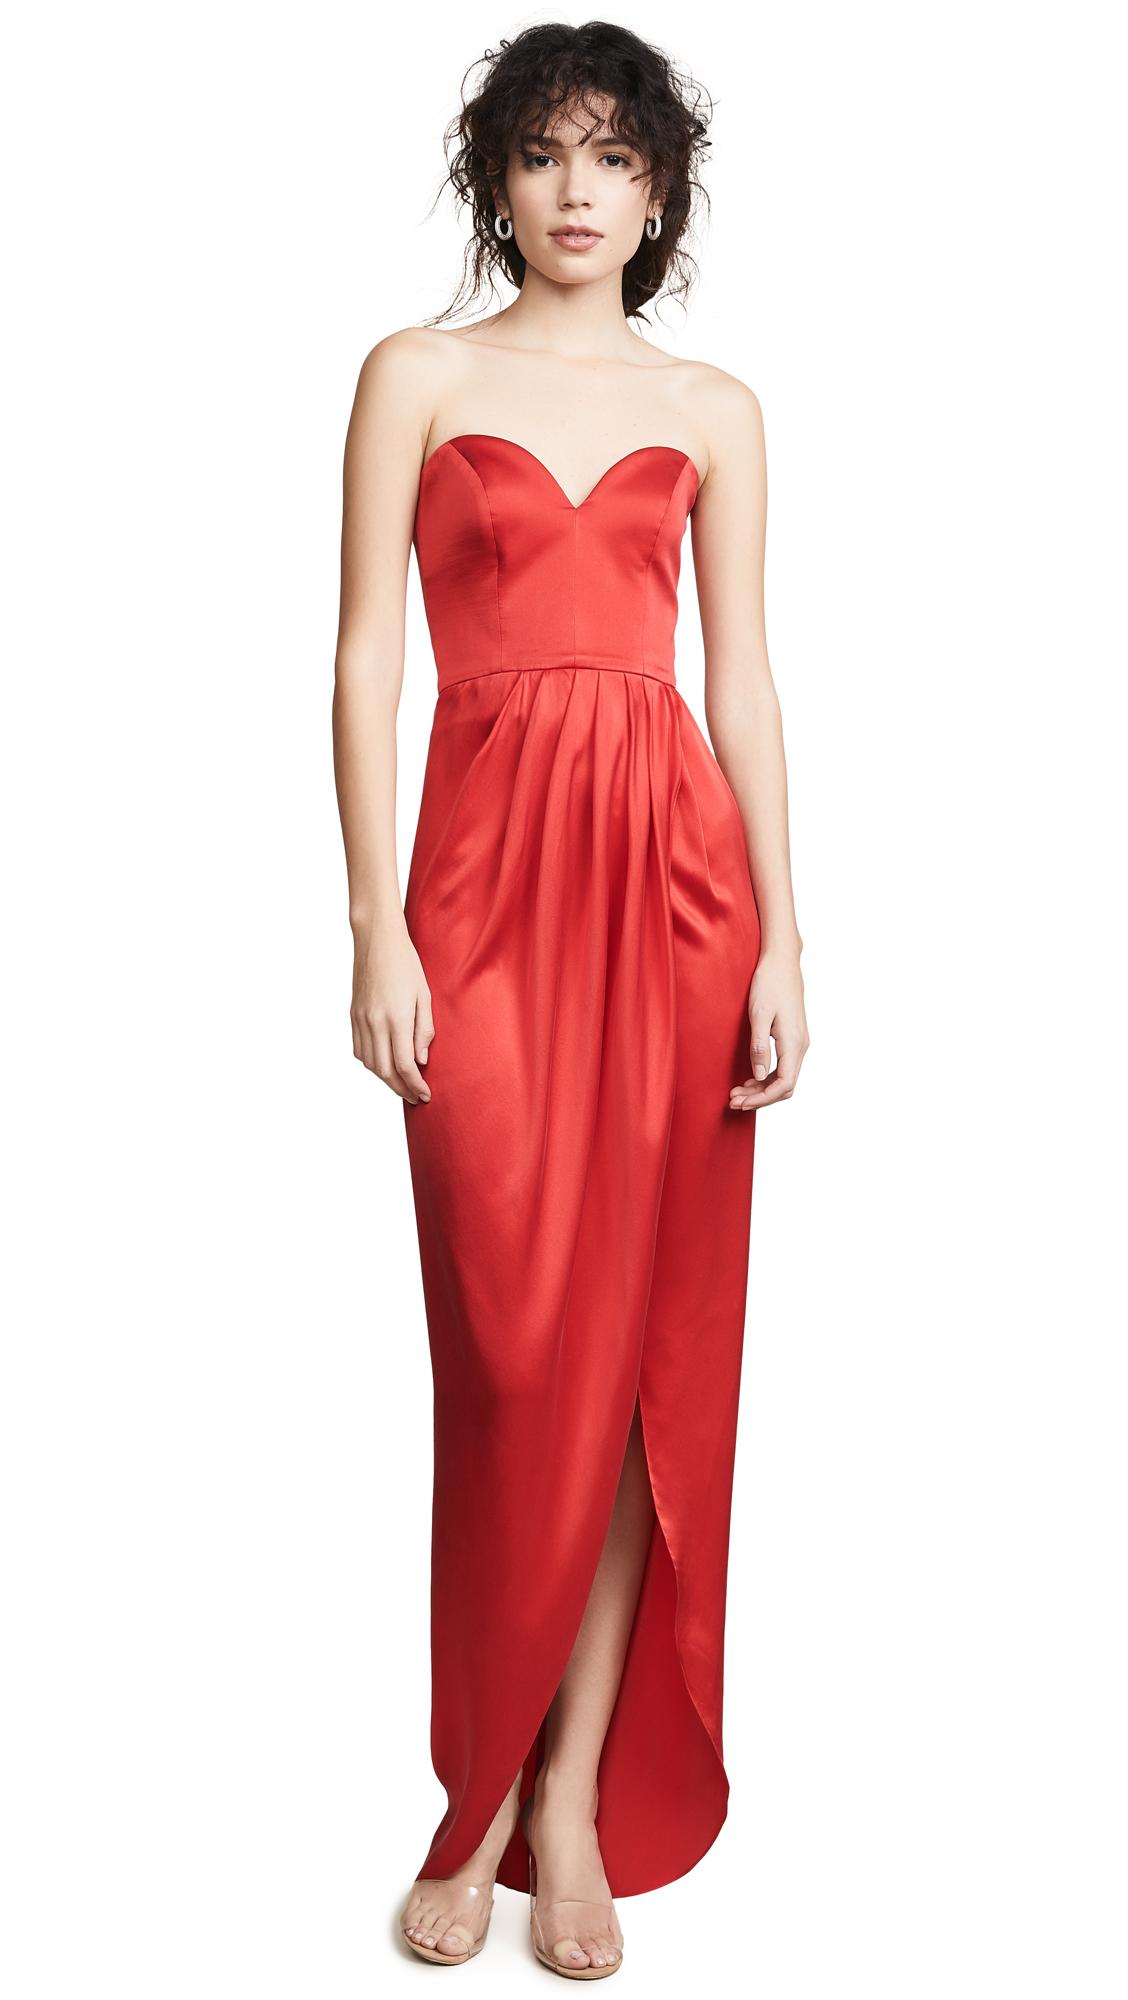 VATANIKA Draped Silk Gown in Red